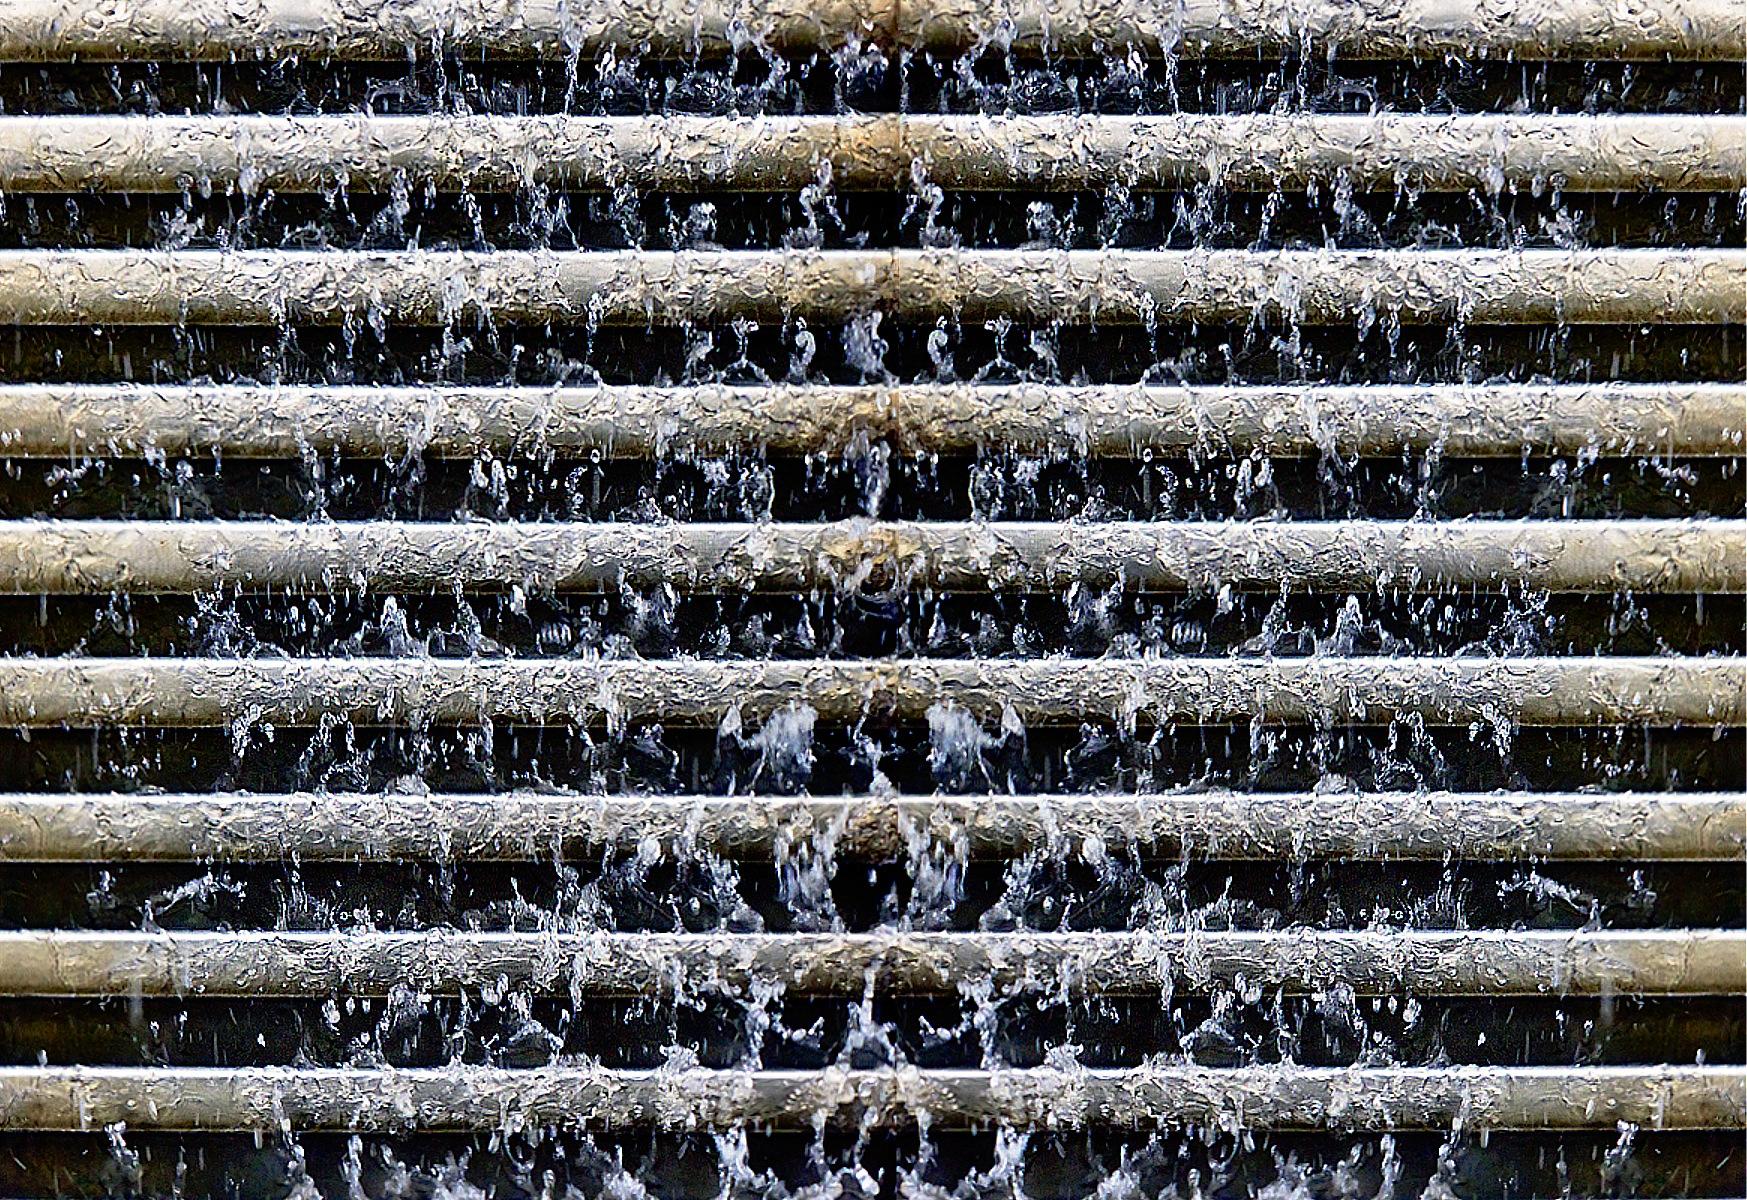 Water by Gernot Schwarz